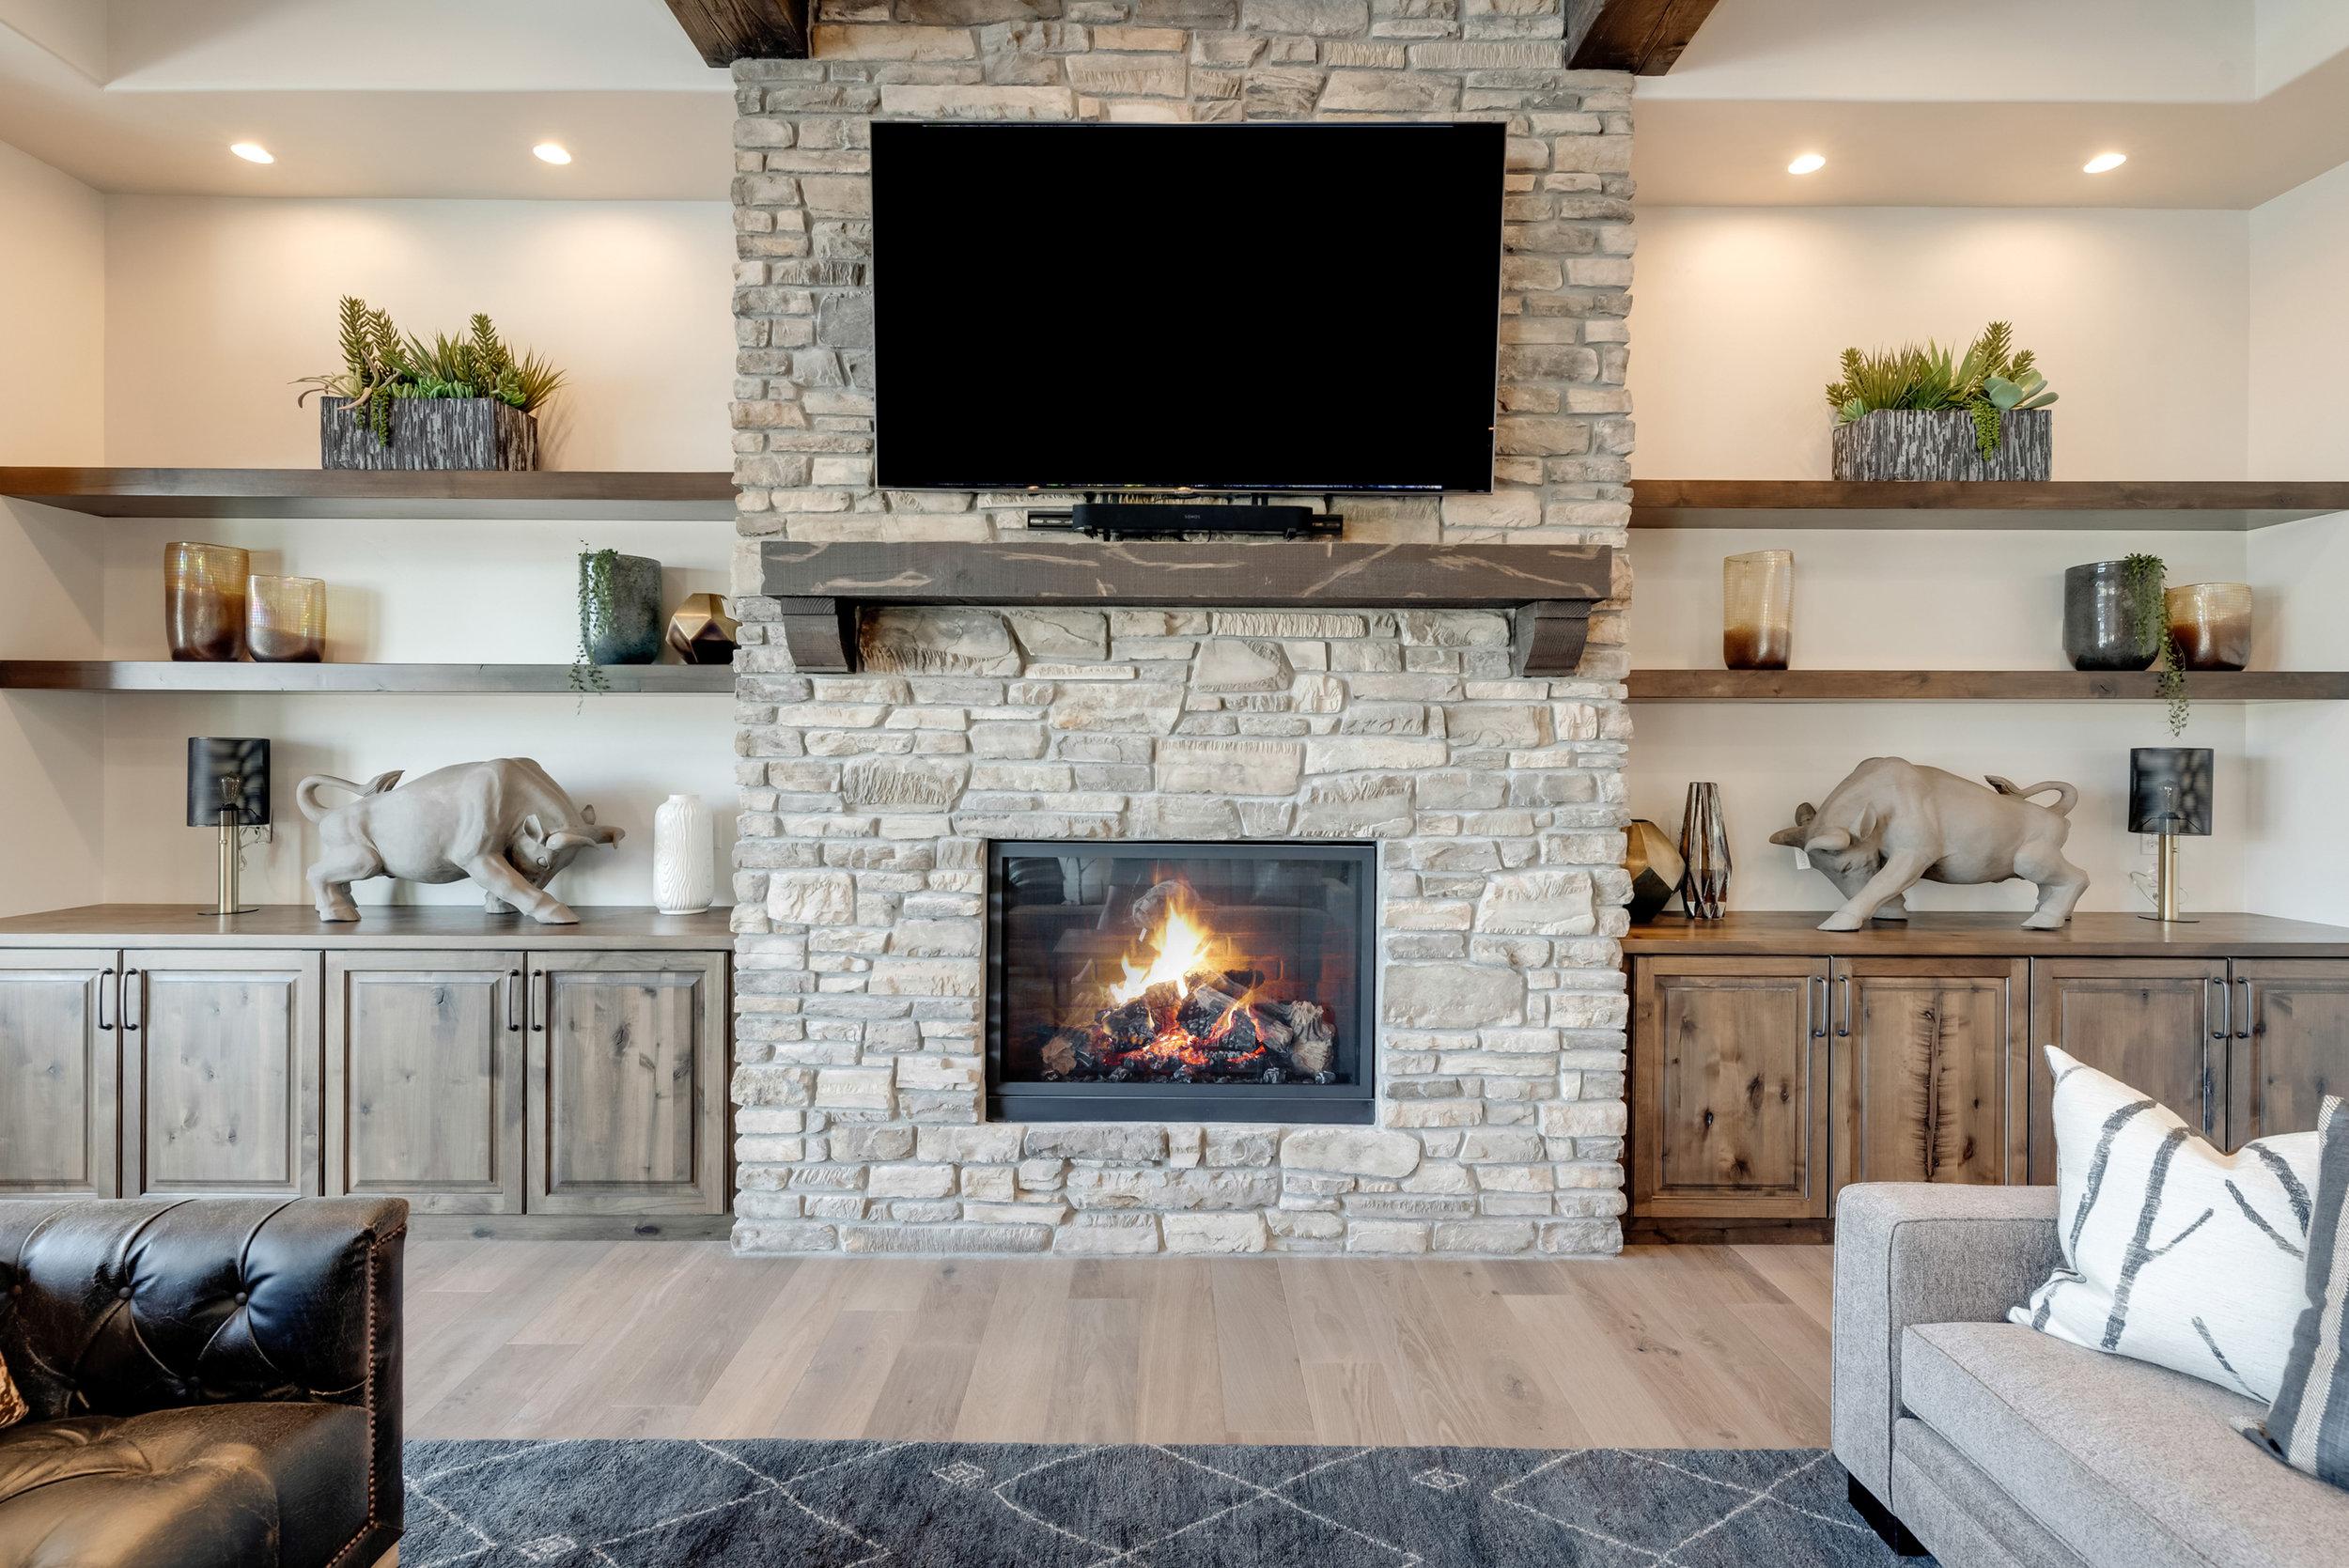 16-Fireplace.jpg